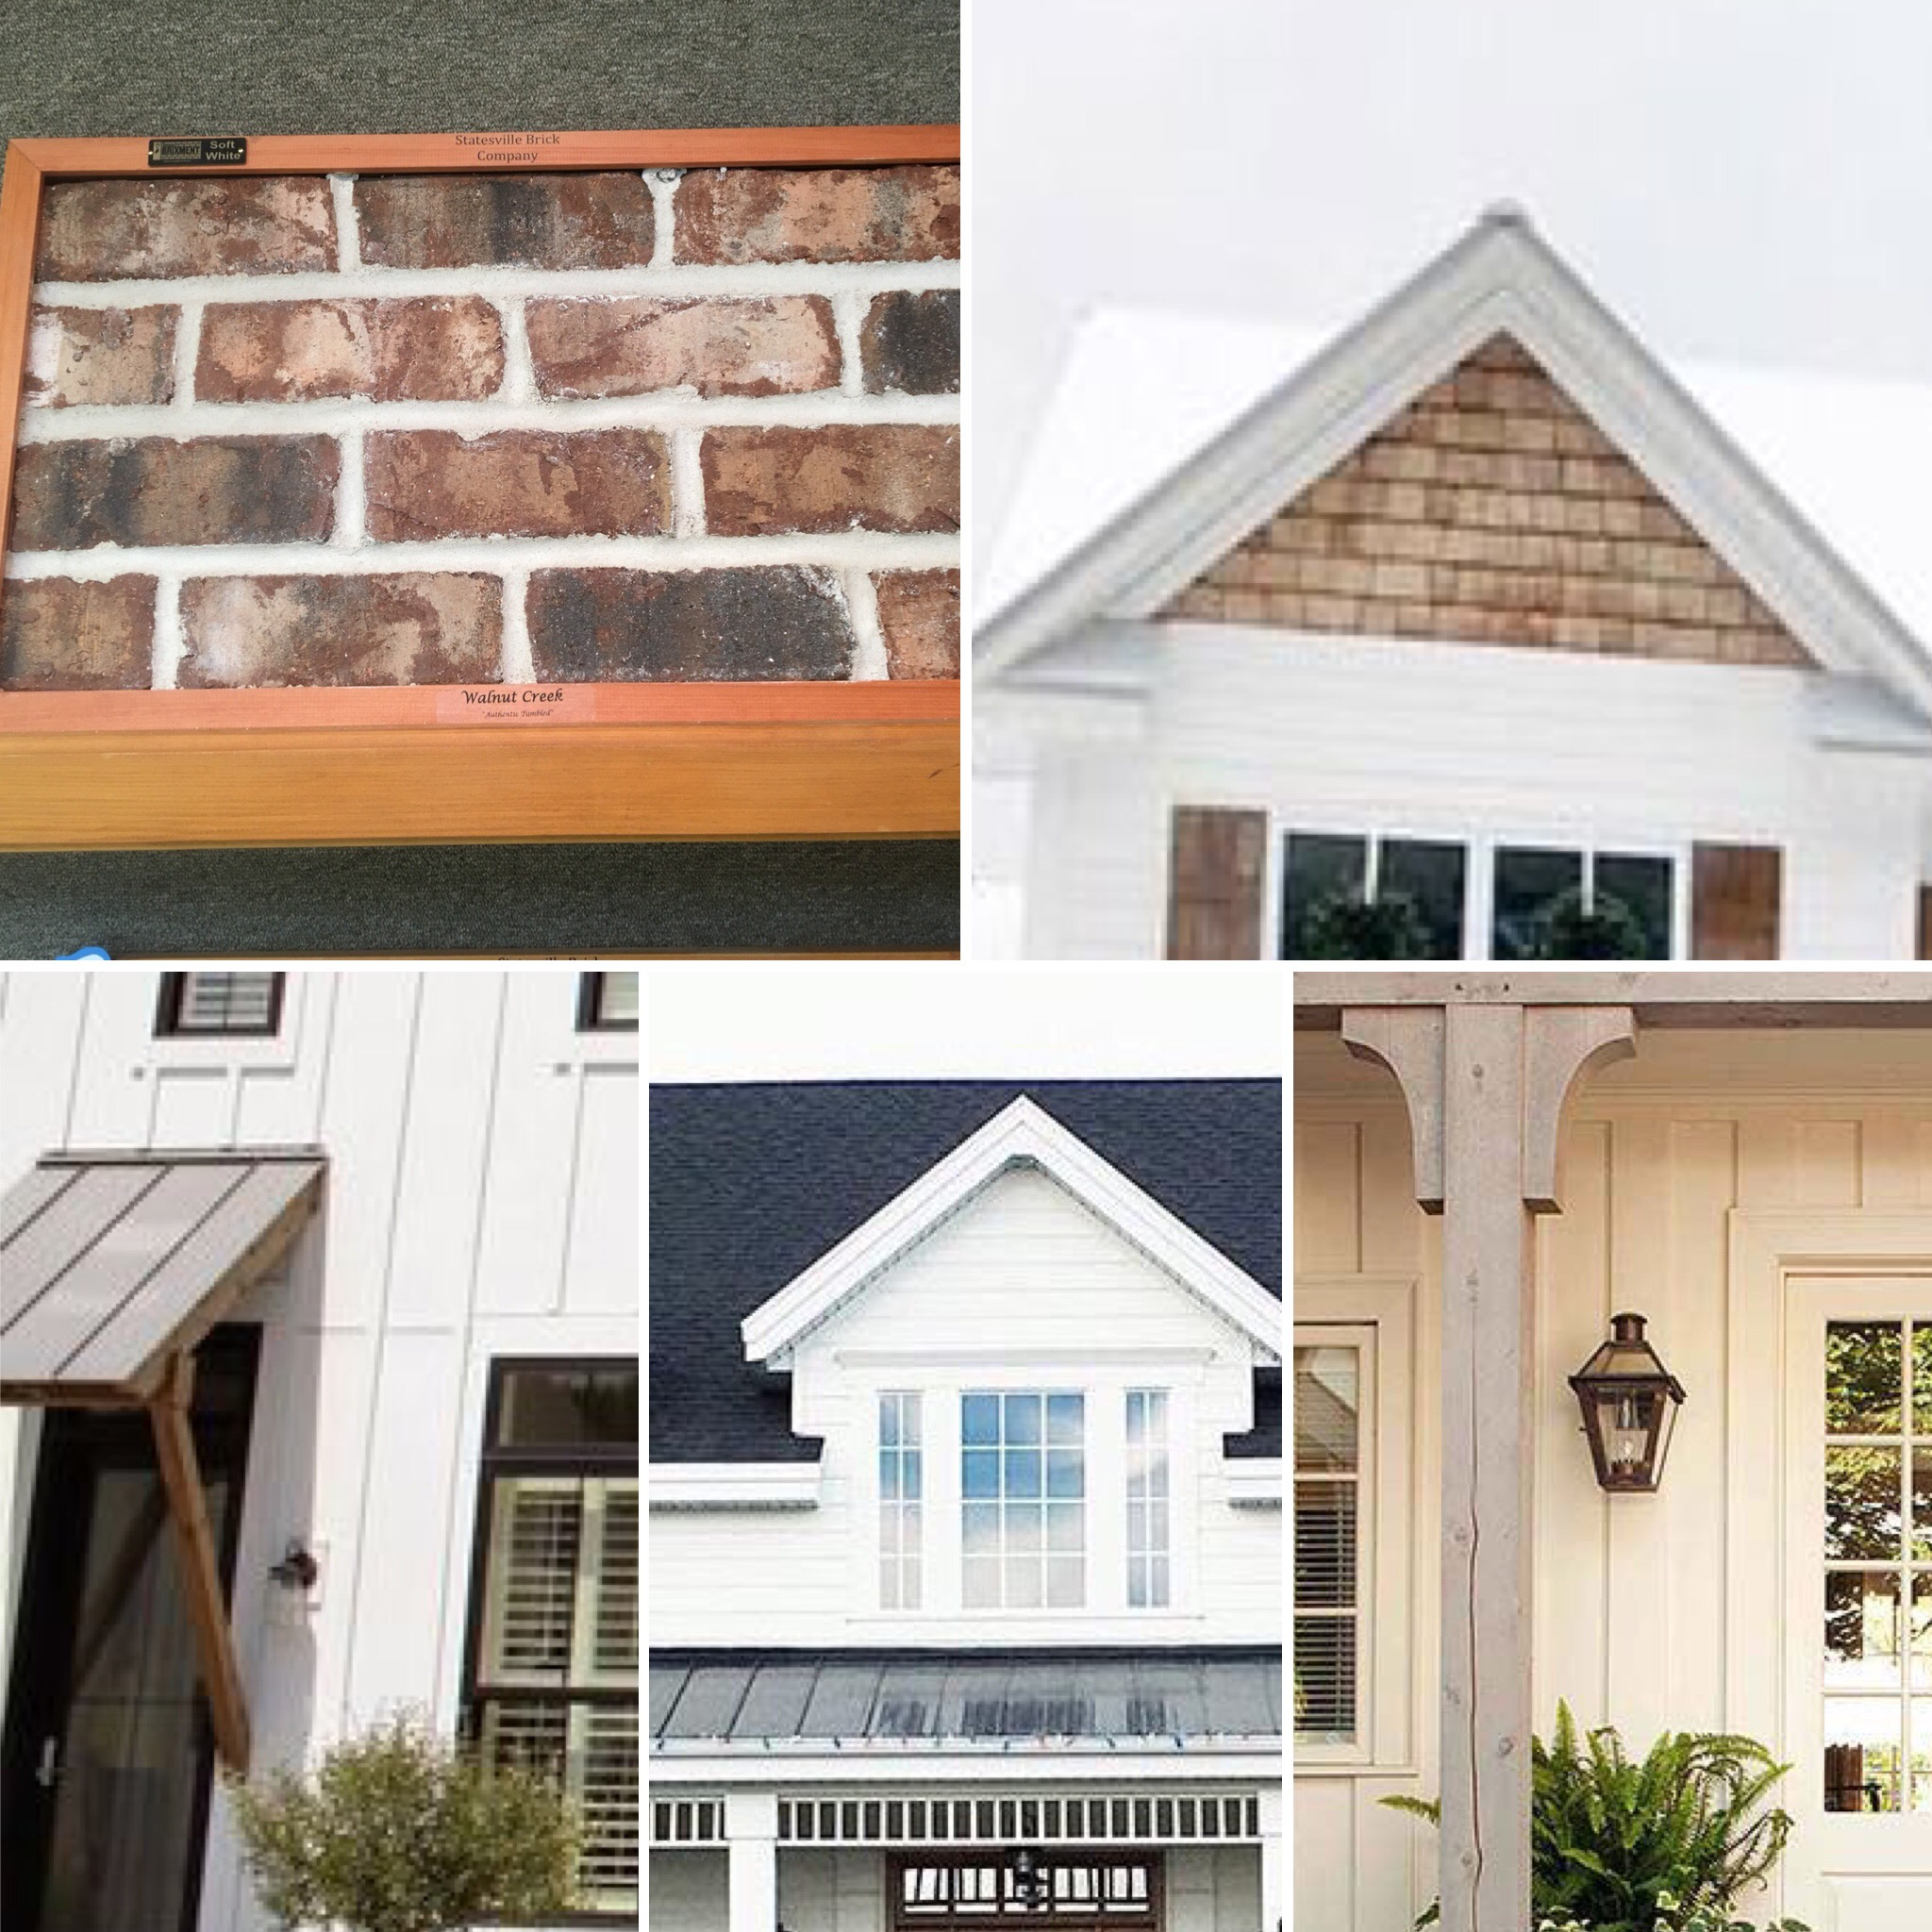 Exterior - Metal & Shingle Roof, neutral brick, cedar shake, vertical lines. Simple yet bold.